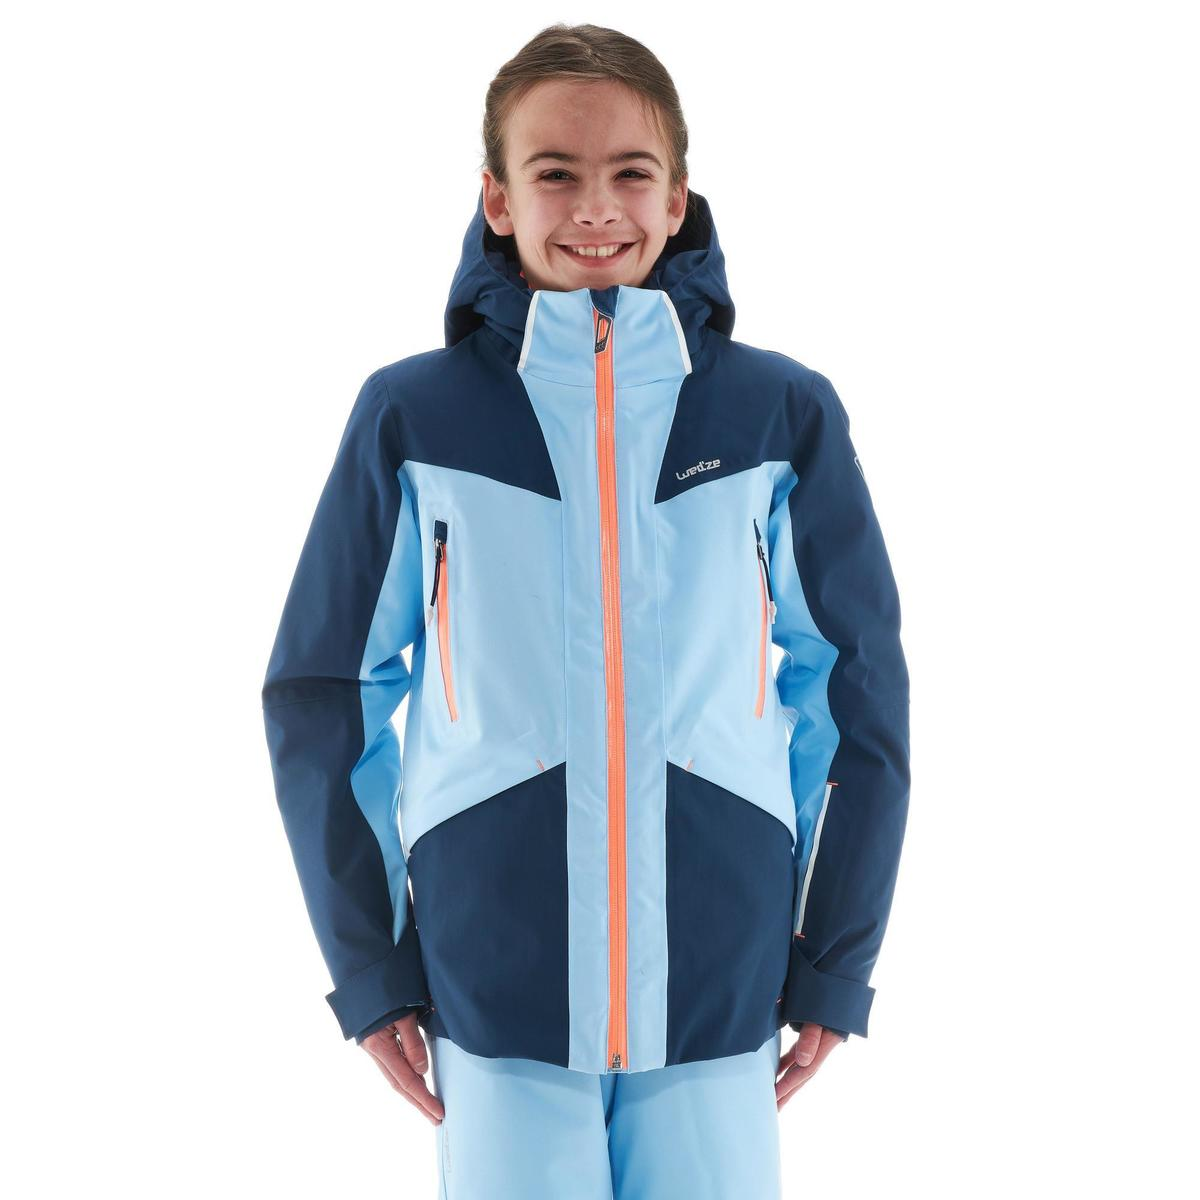 Bild 3 von Skijacke Piste 900 Kinder blau